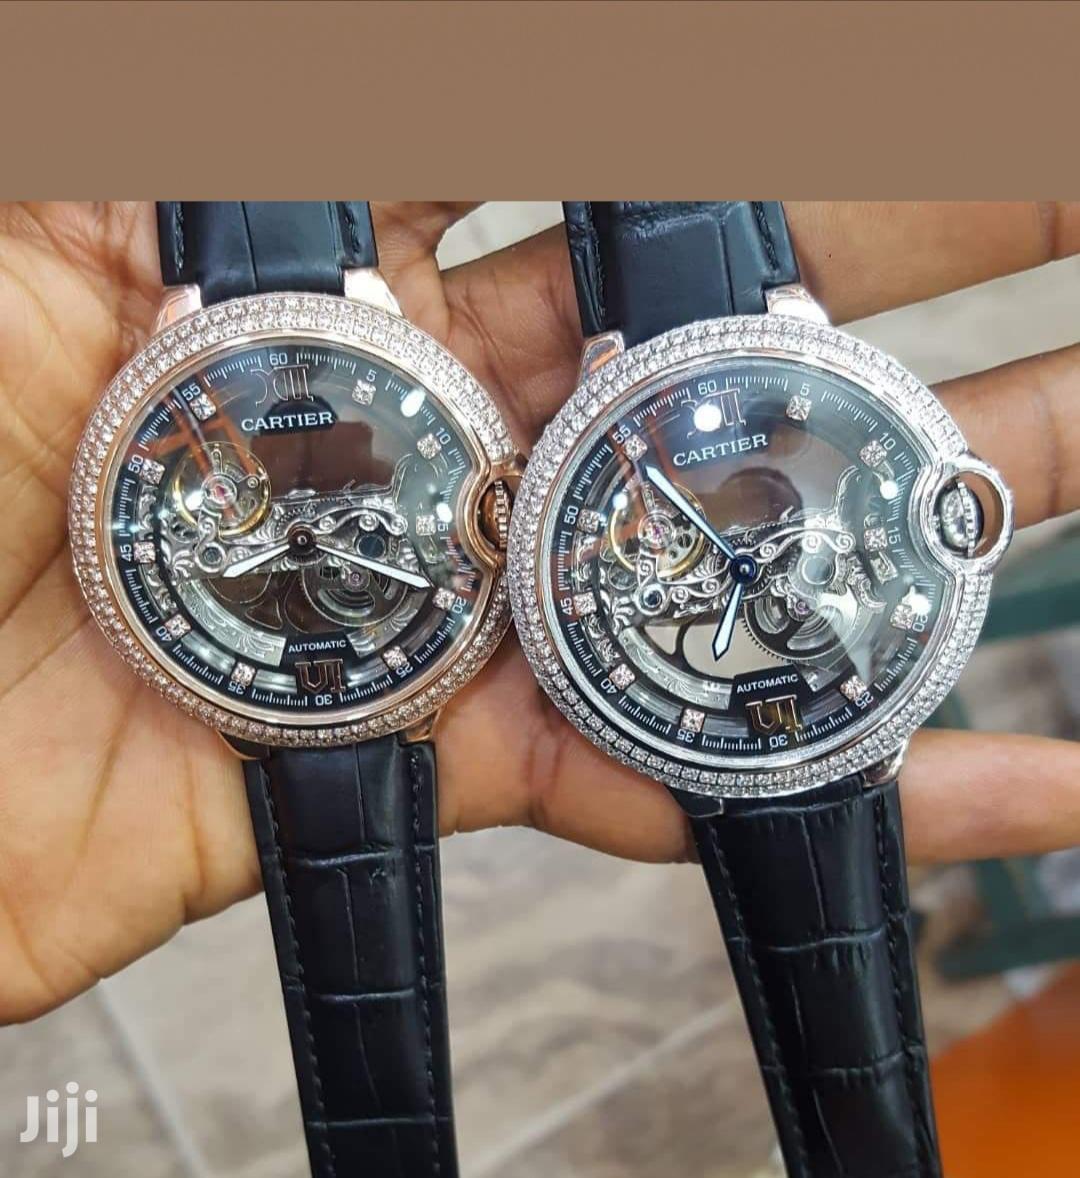 Cartier Leather Wrist Watch